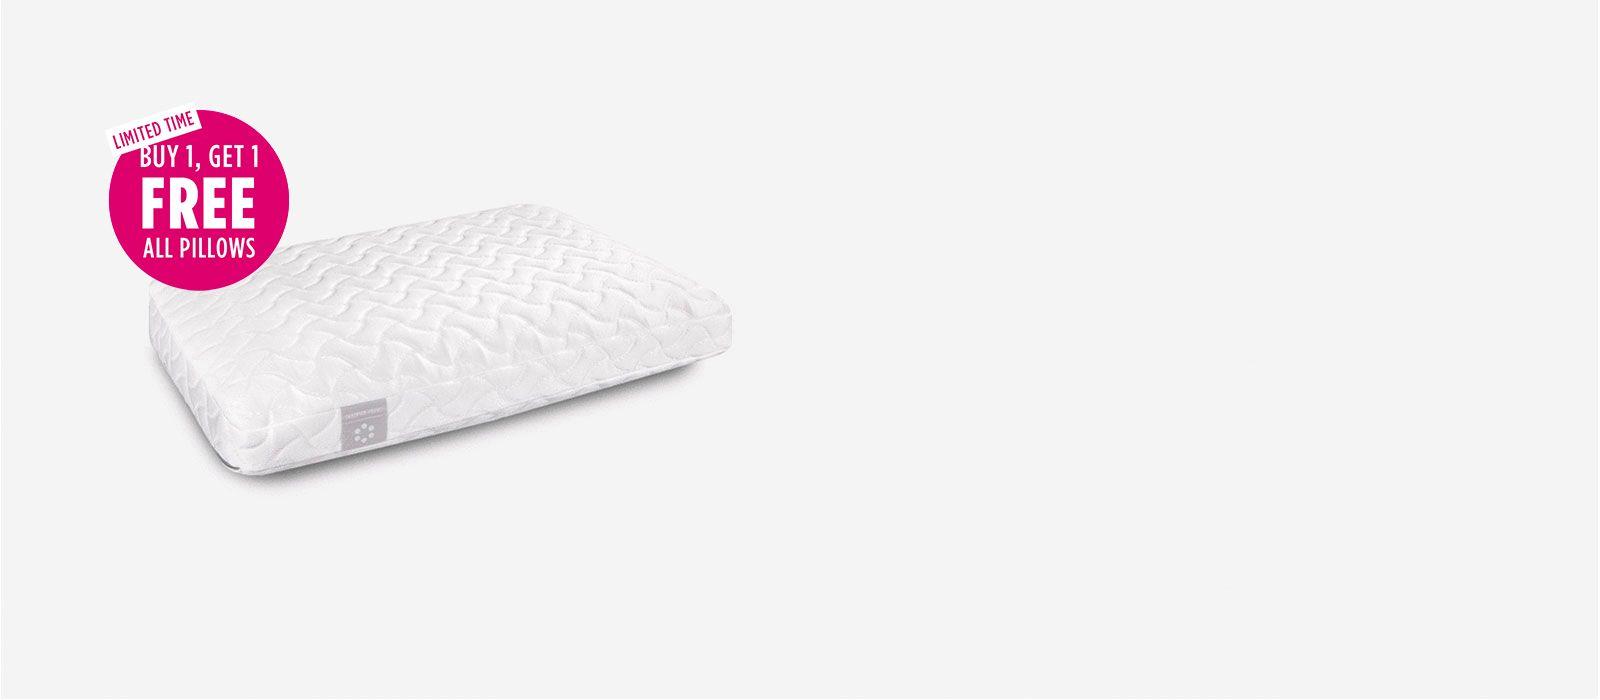 Tempur Cloud Pillow | Traditional